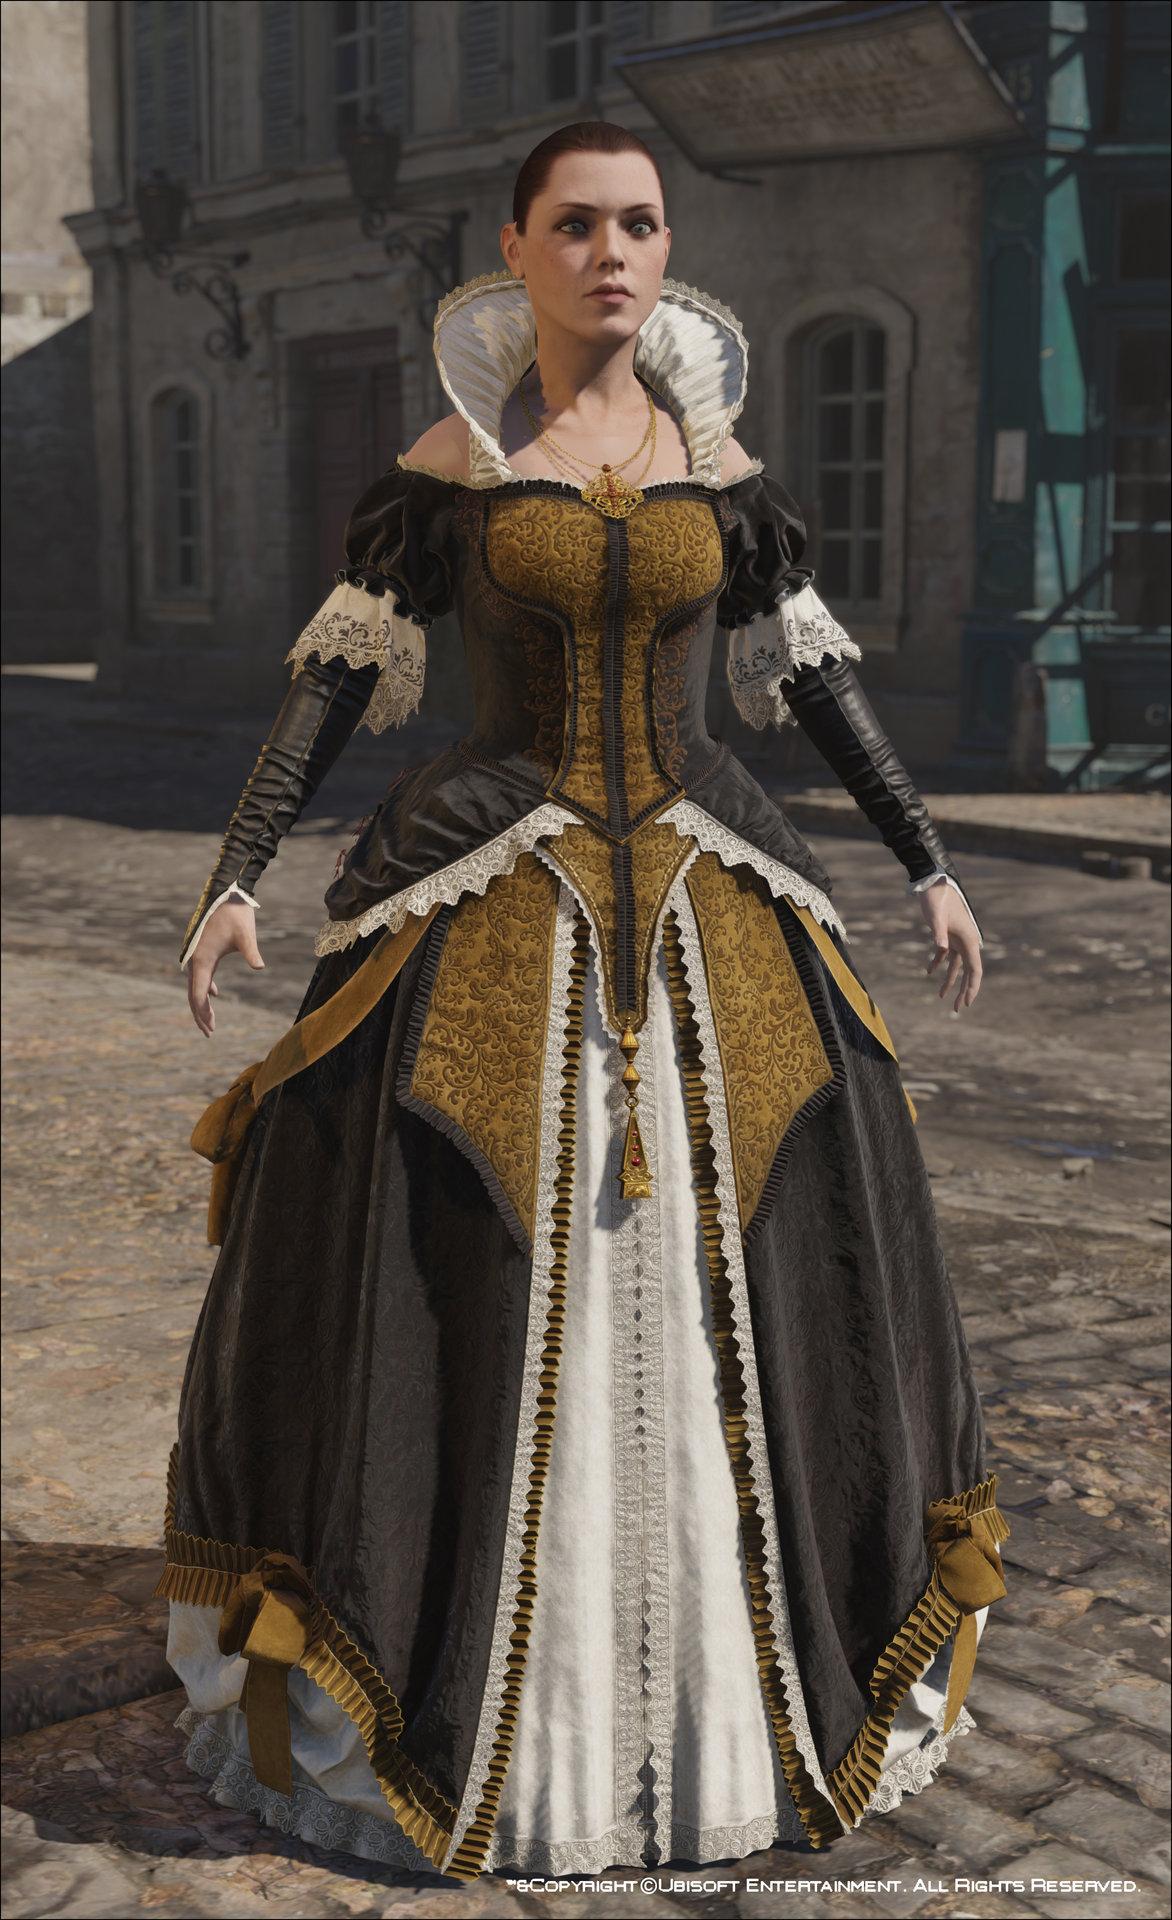 ArtStation - Assassin's Creed Unity, Elise's Evening Dress